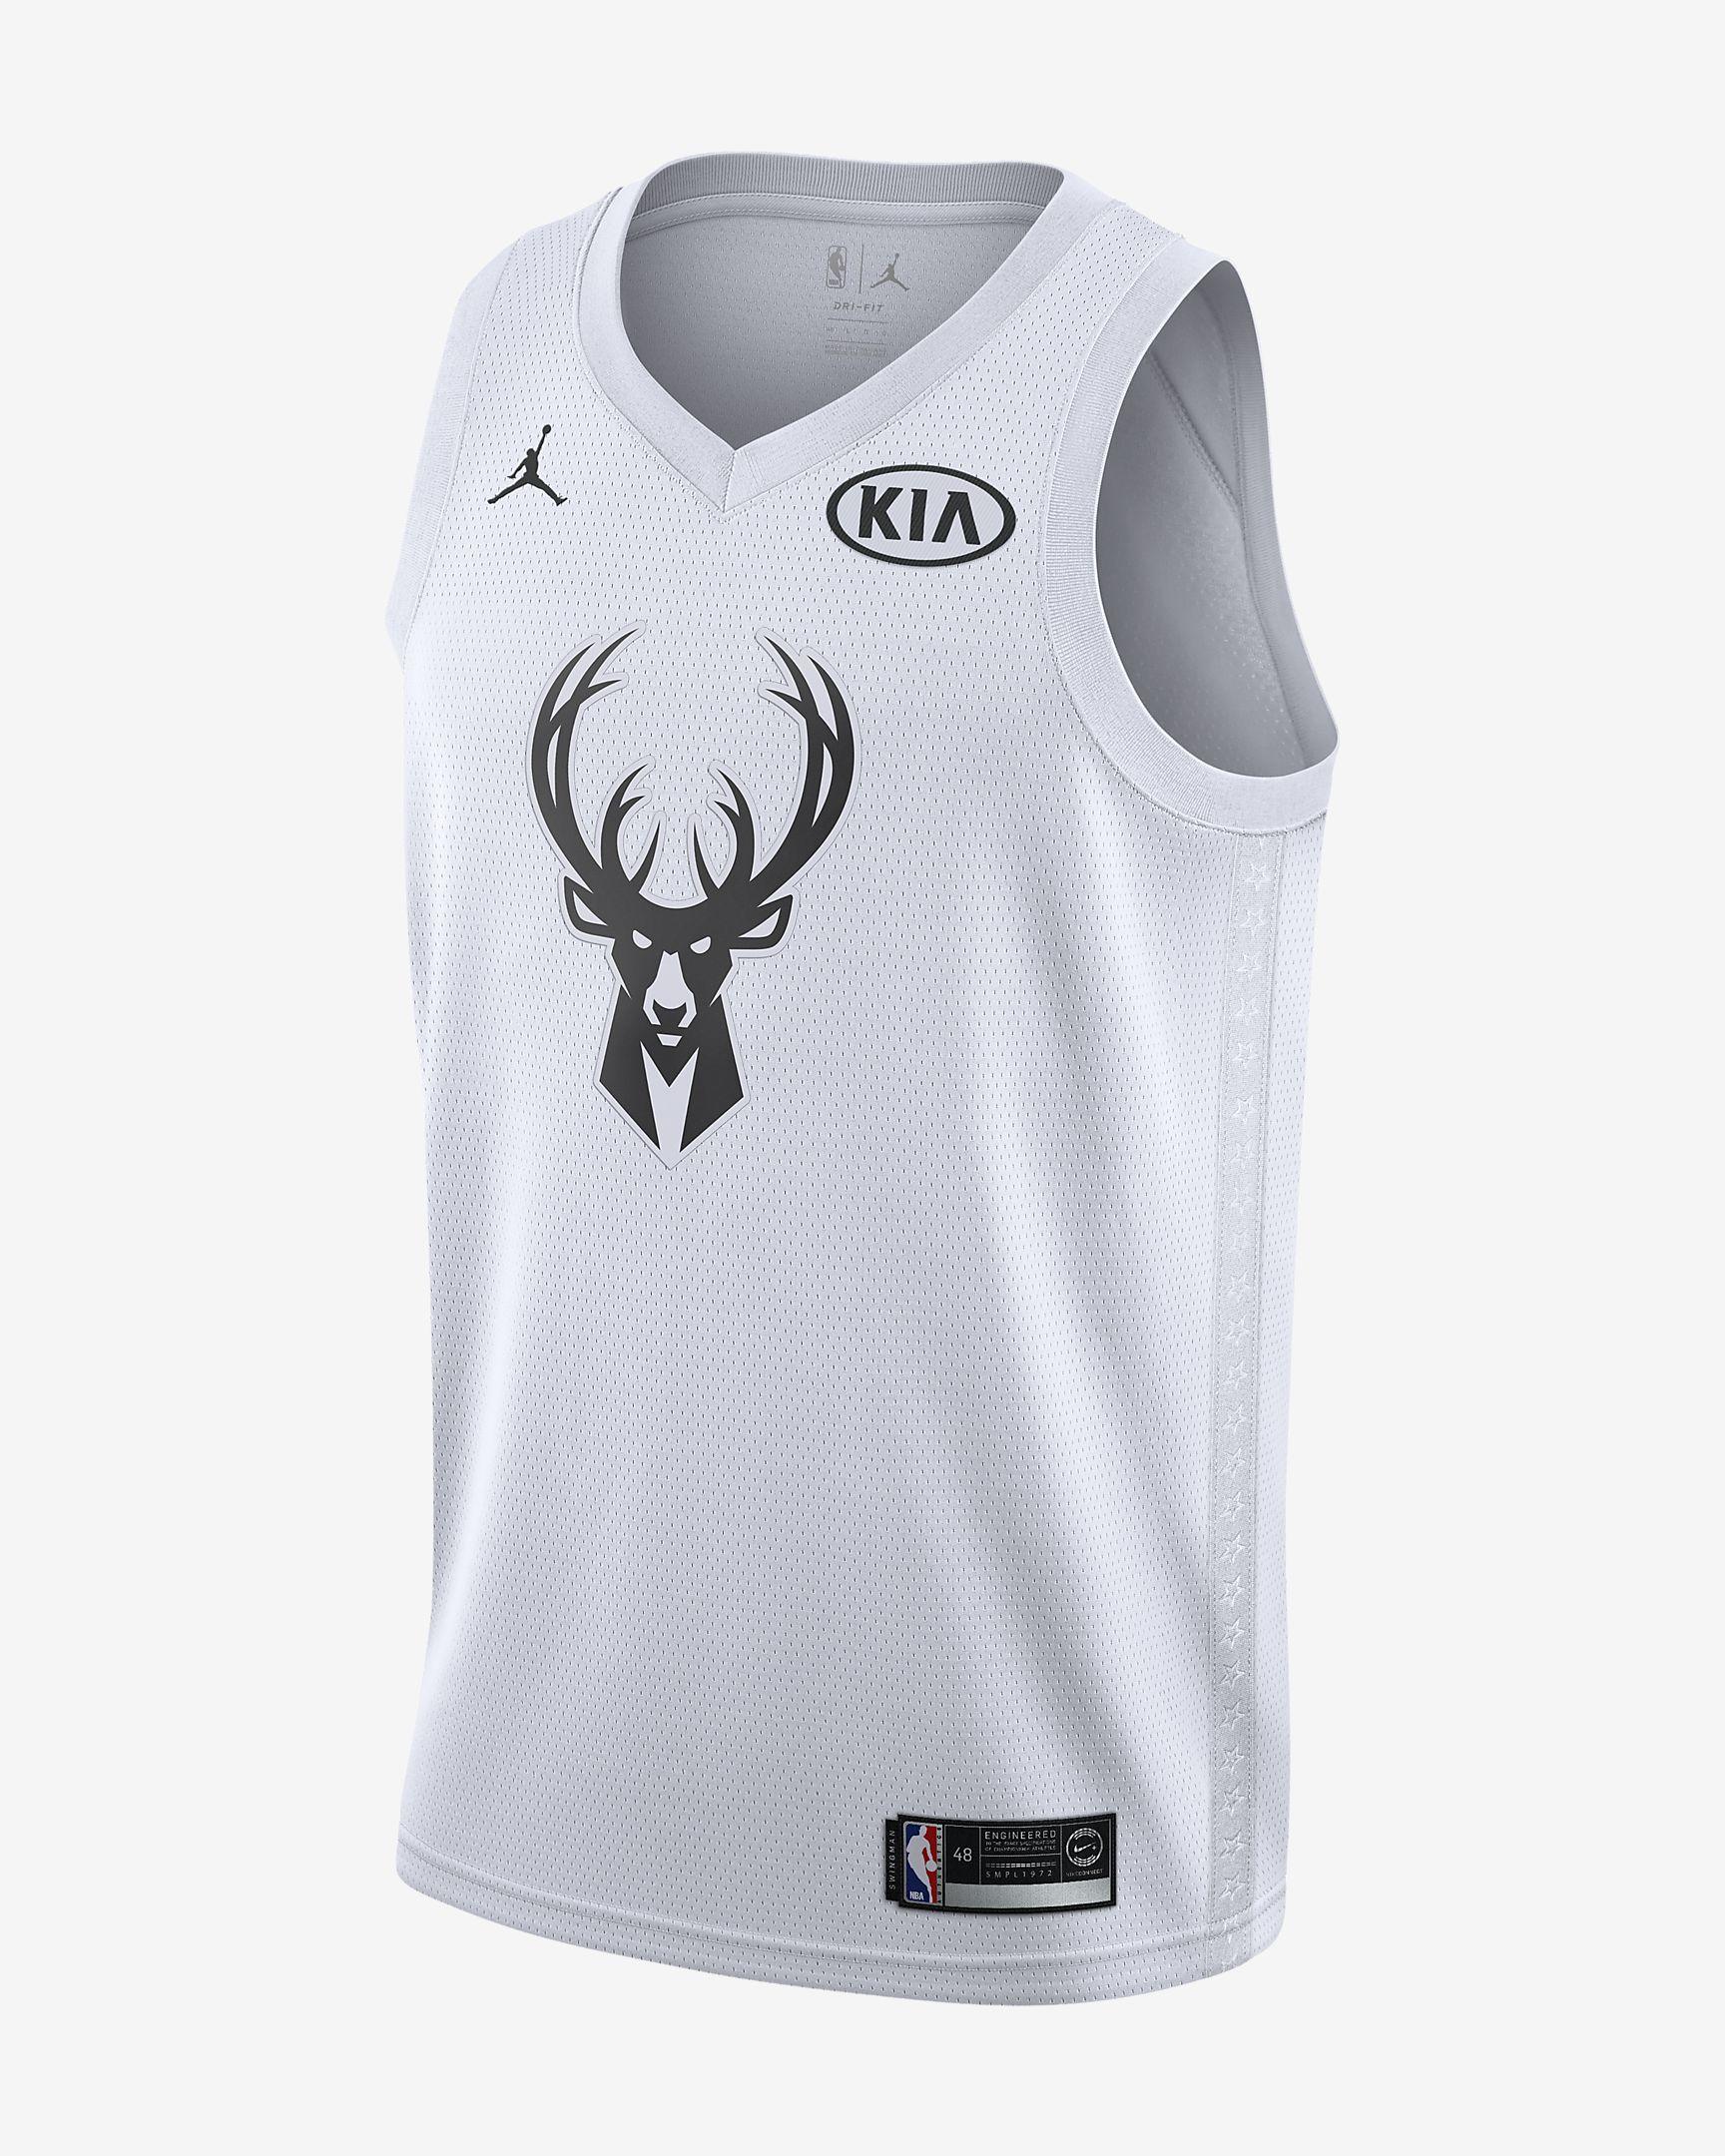 Jordan NBA Giannis Antetokounmpo All-Star Edition Swingman Jersey - NBA  Shop Milwaukee Bucks Merchandise - Superfanas.lt afb81d3d7